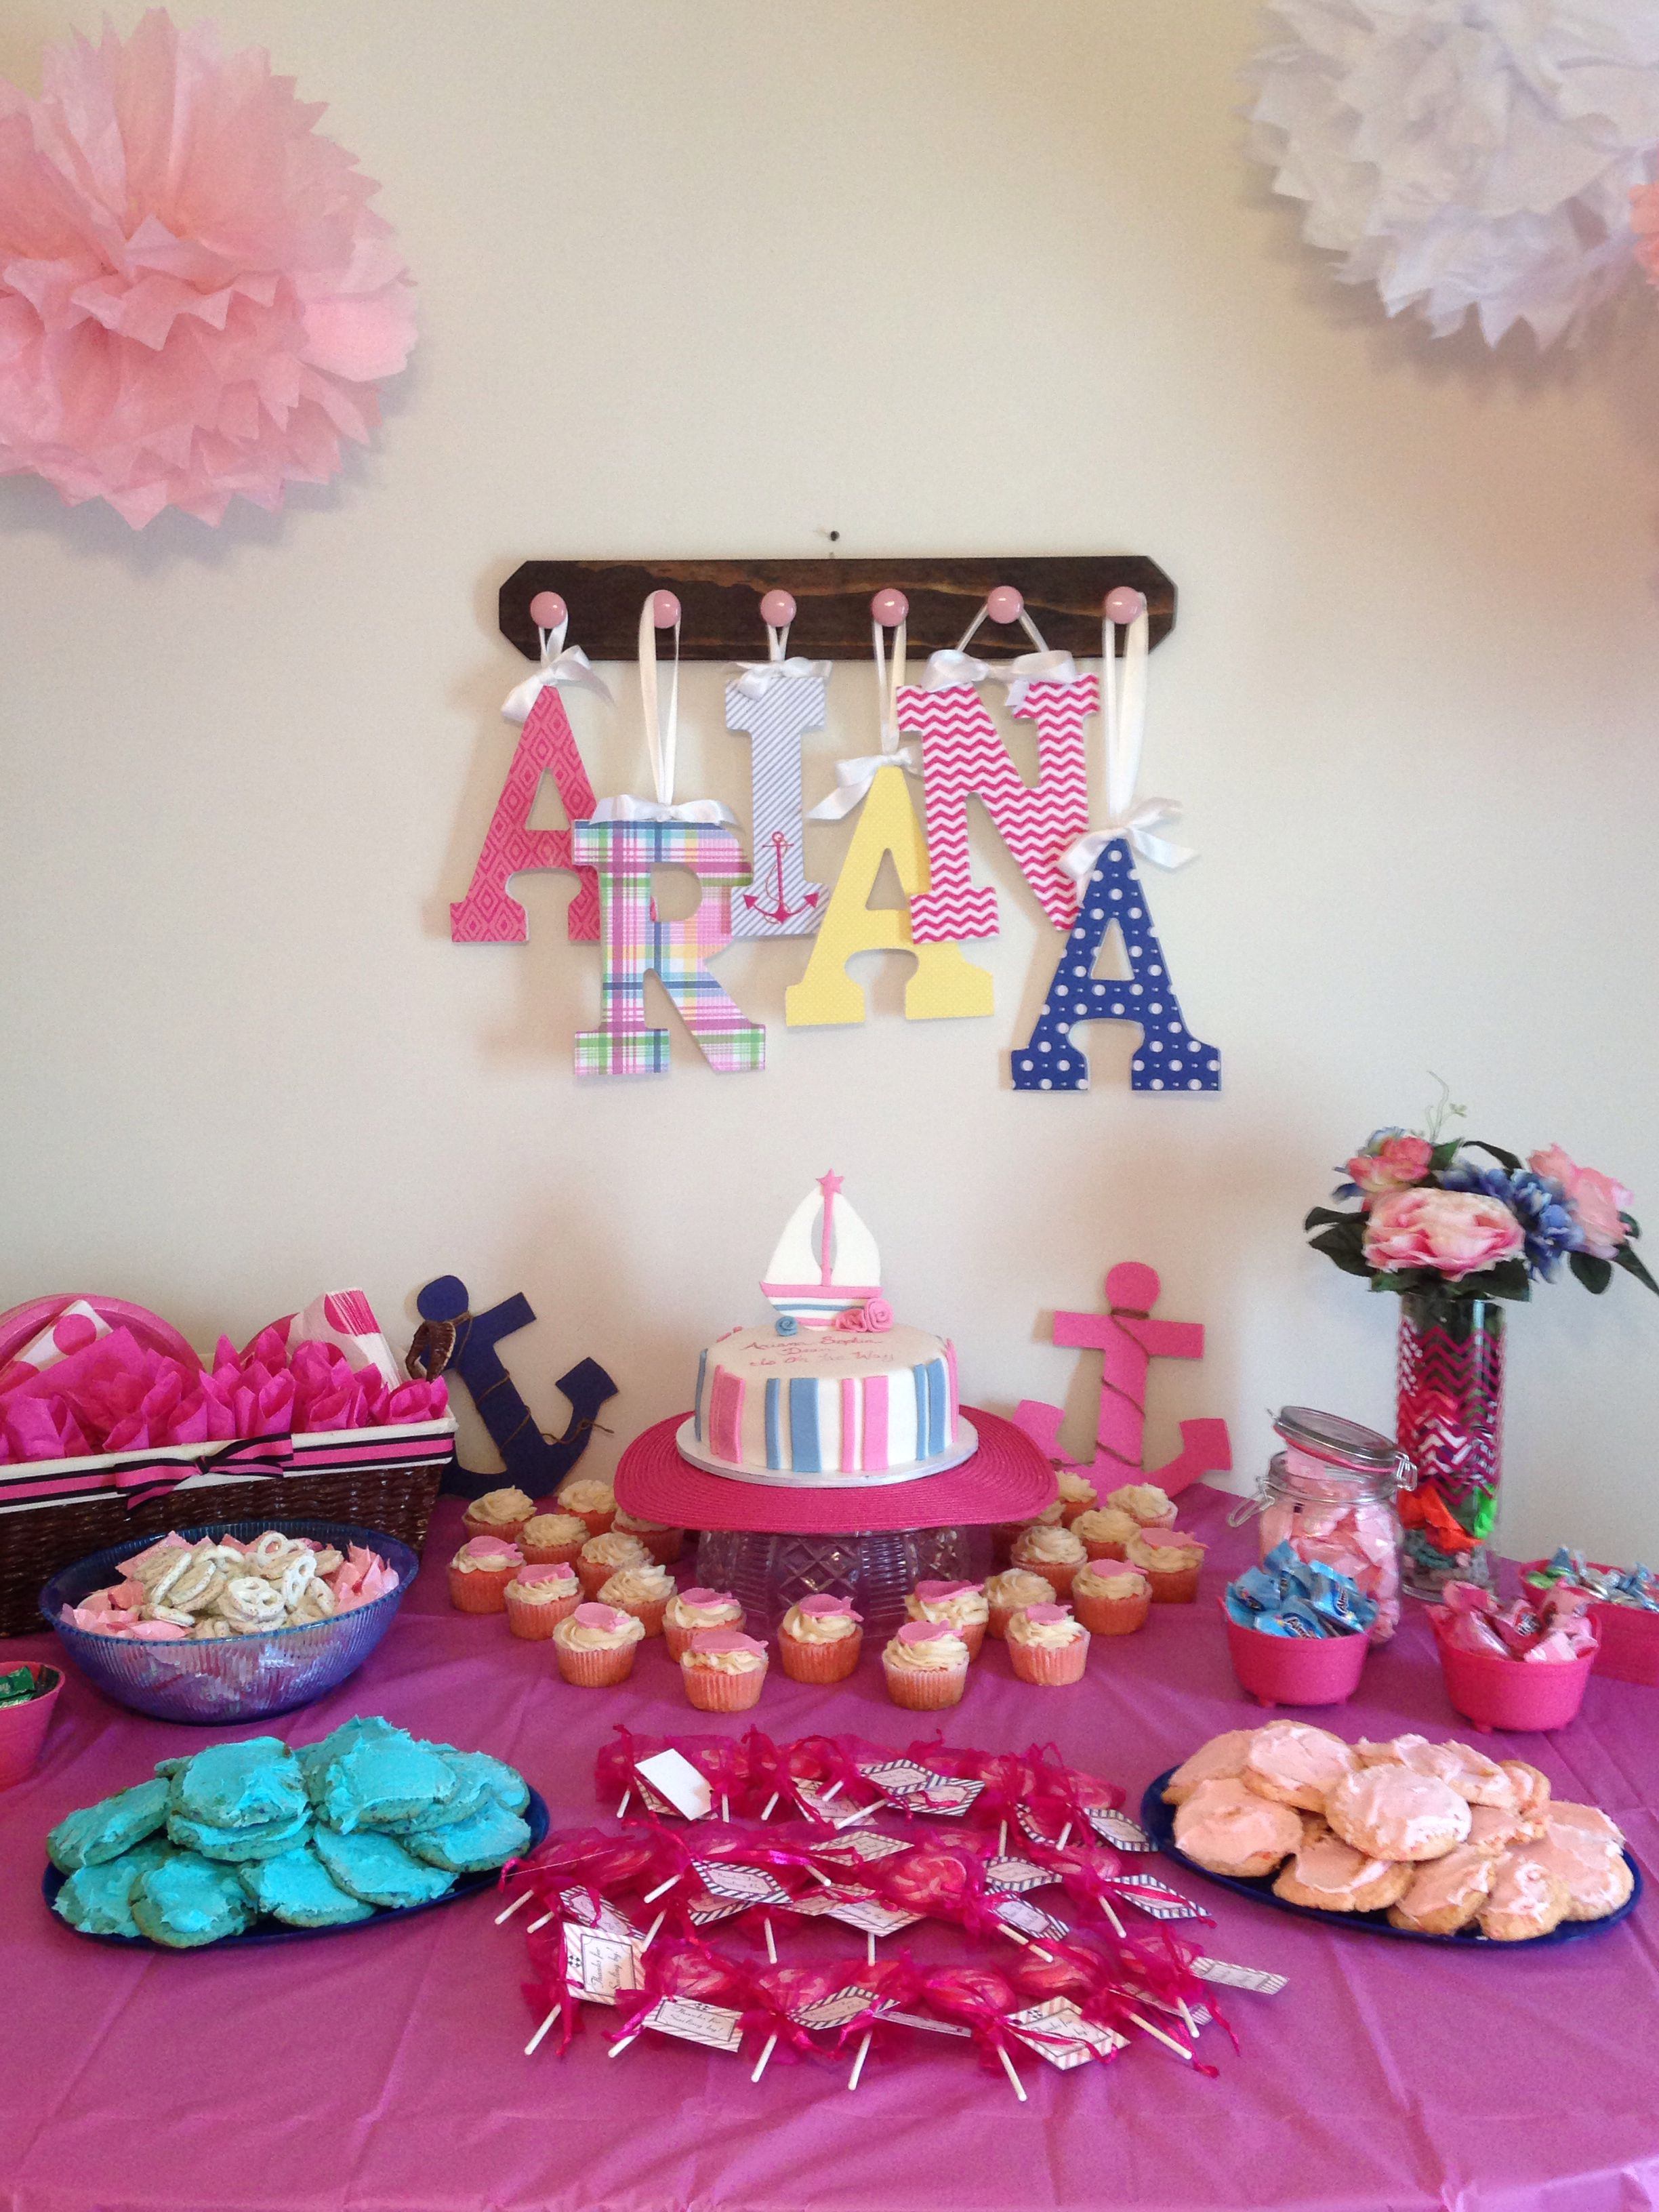 Nautical girl baby shower theme Arts & crafts Pinterest